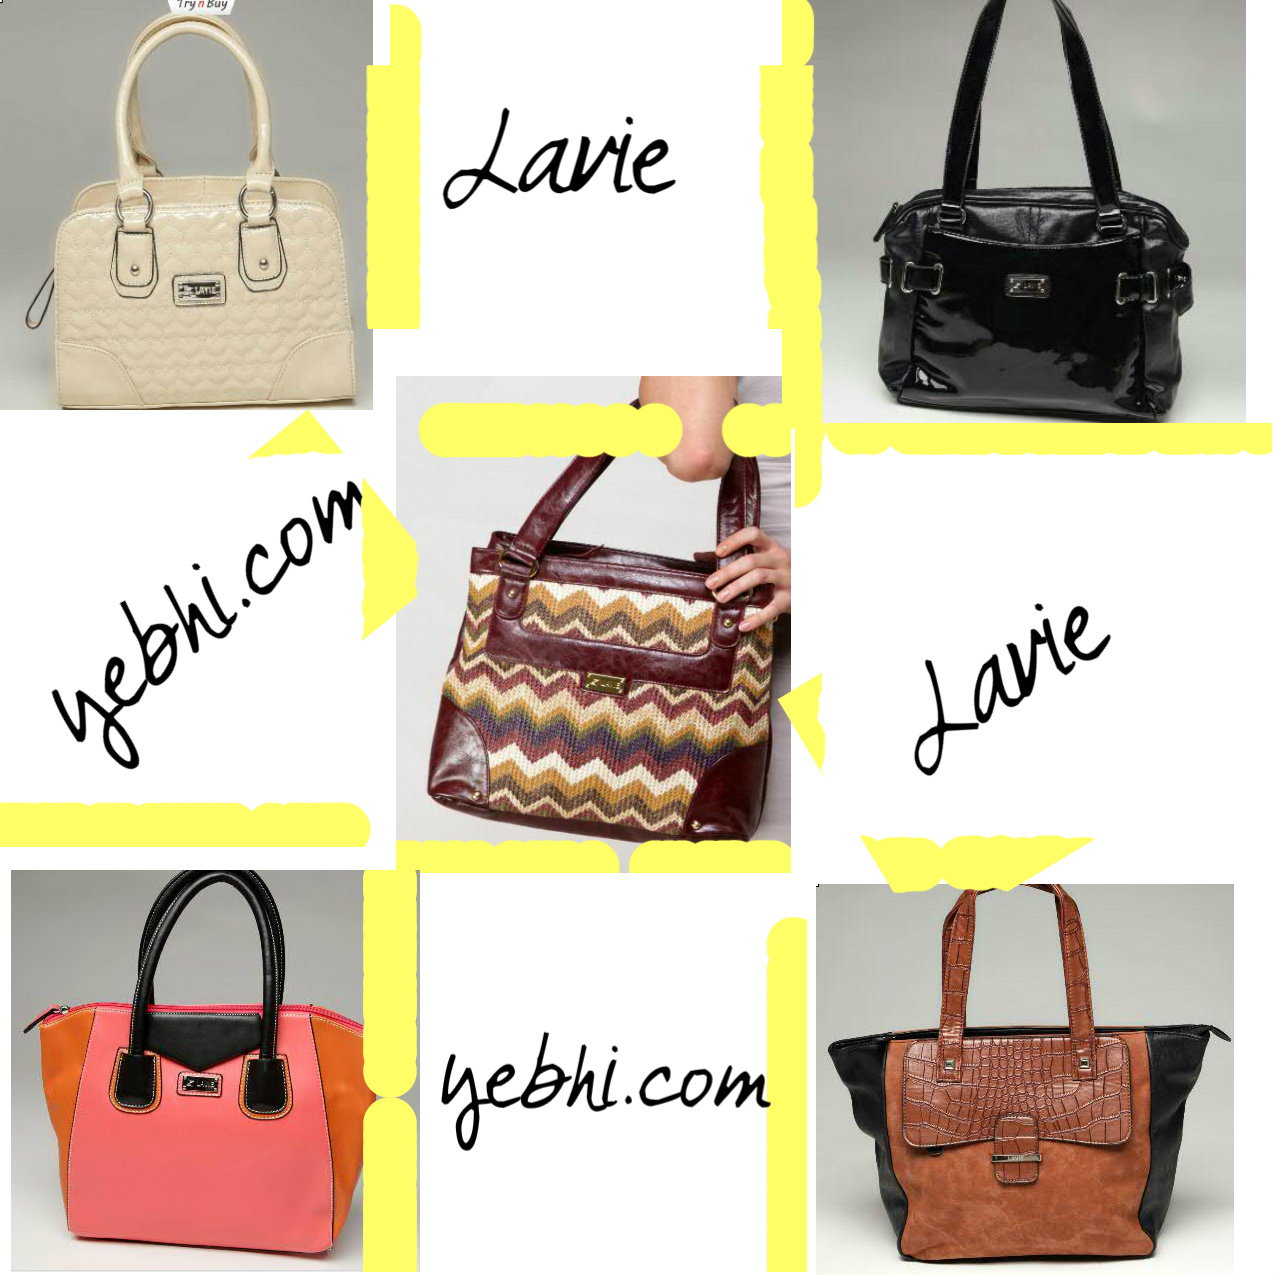 26d54b6f0f7 Shop for Lavie Handbags and Meet Kareena Kapoor - Shopping